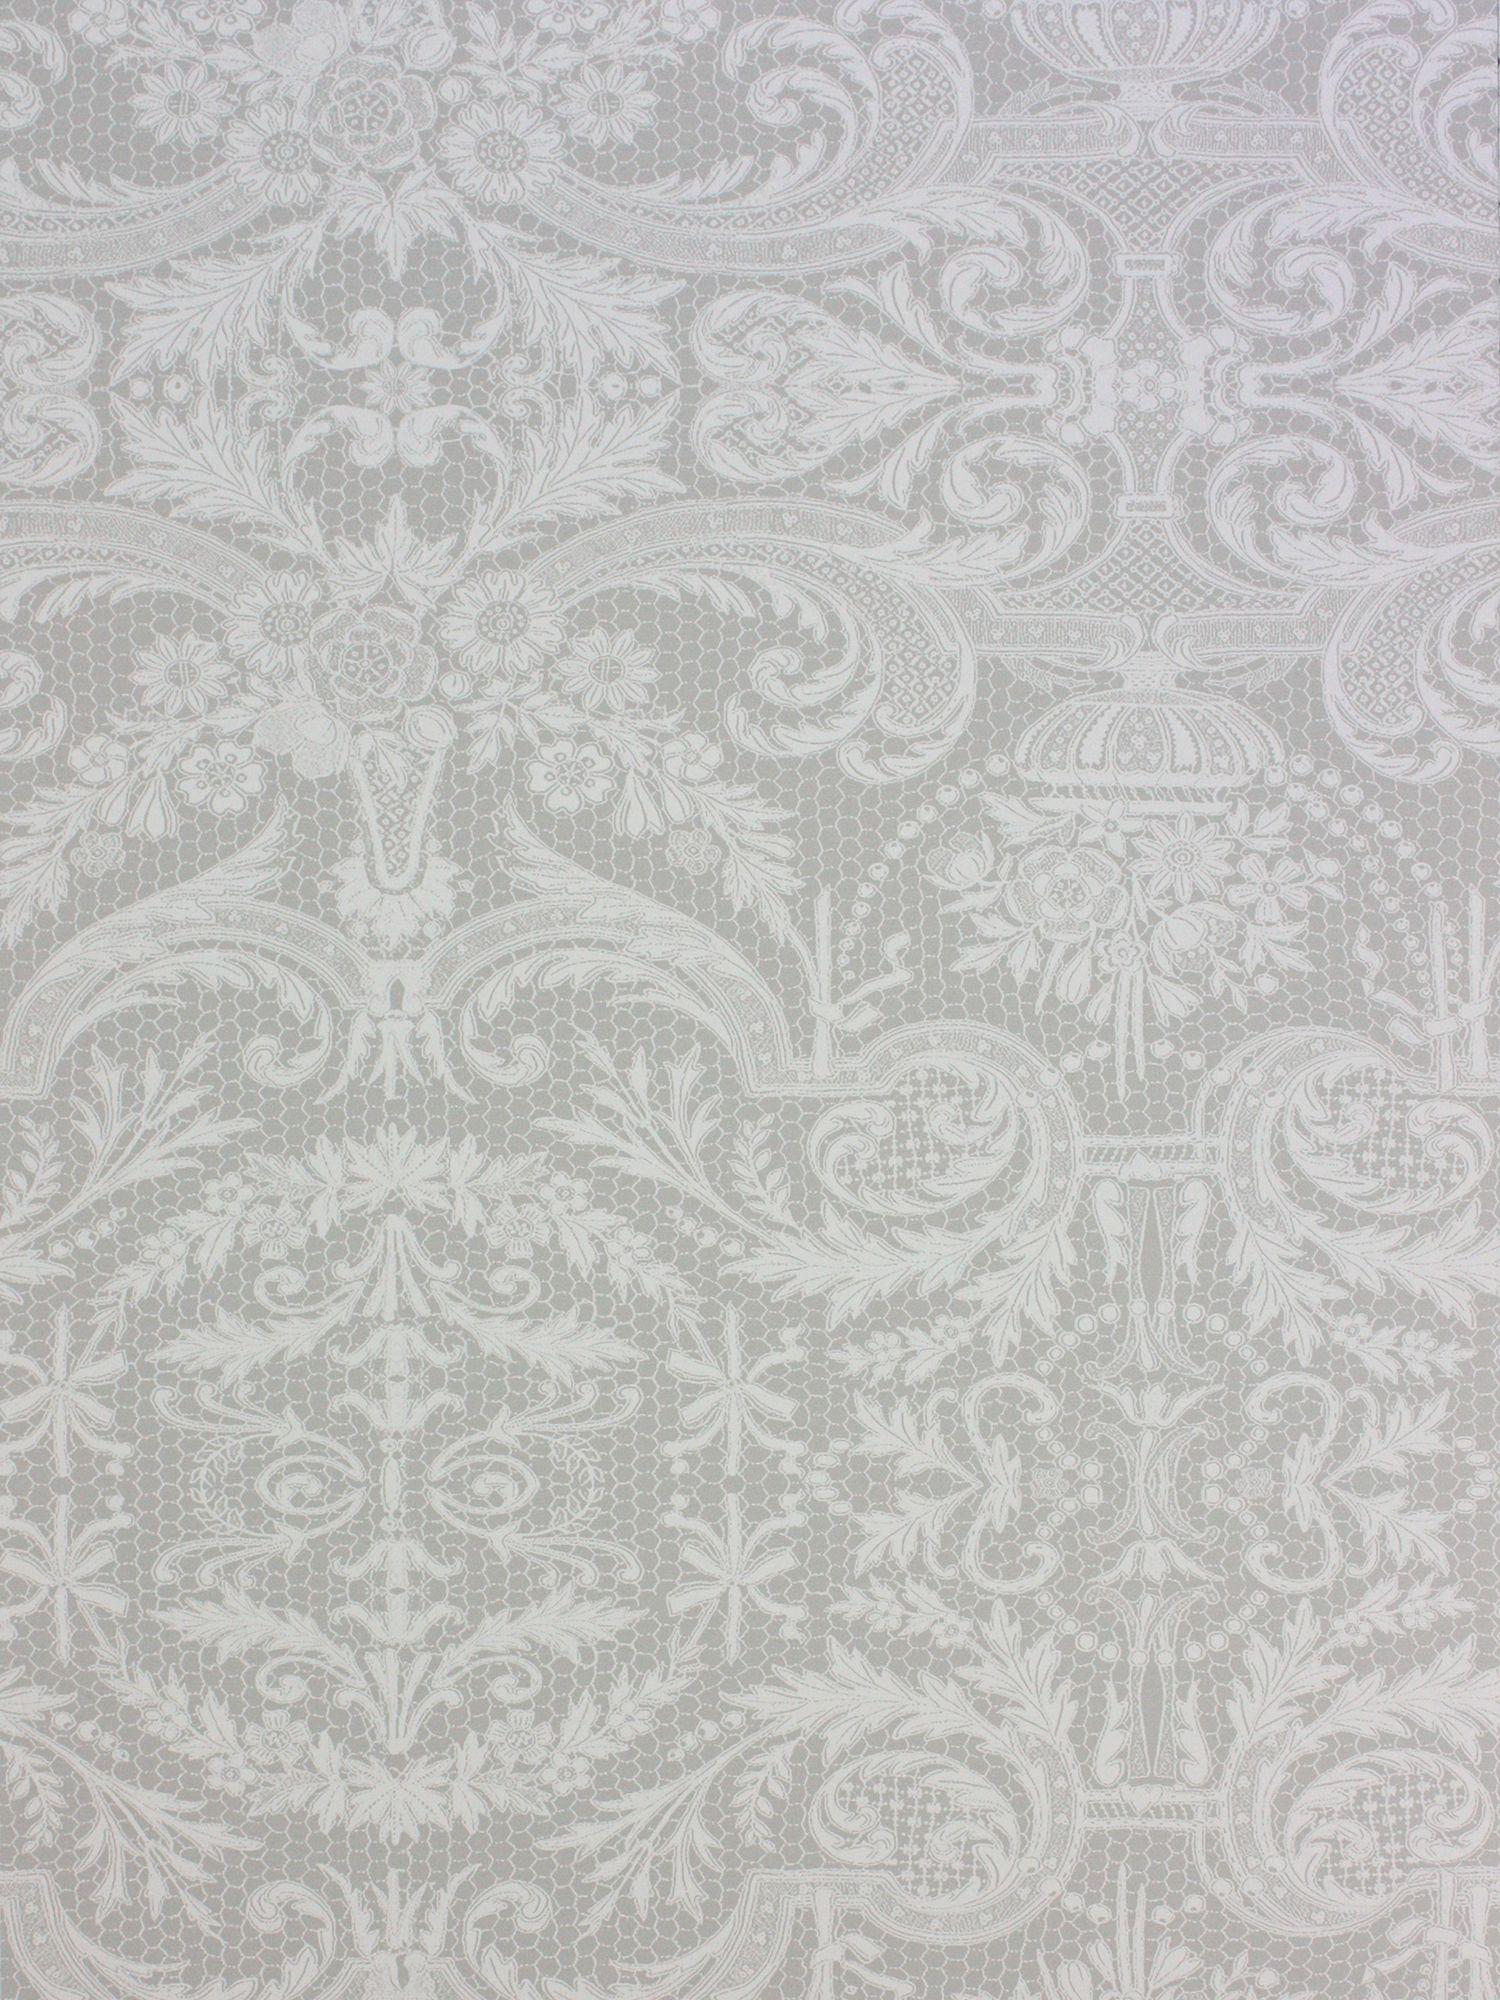 Matthew Williamson Matthew Williamson Orangery Lace Wallpaper